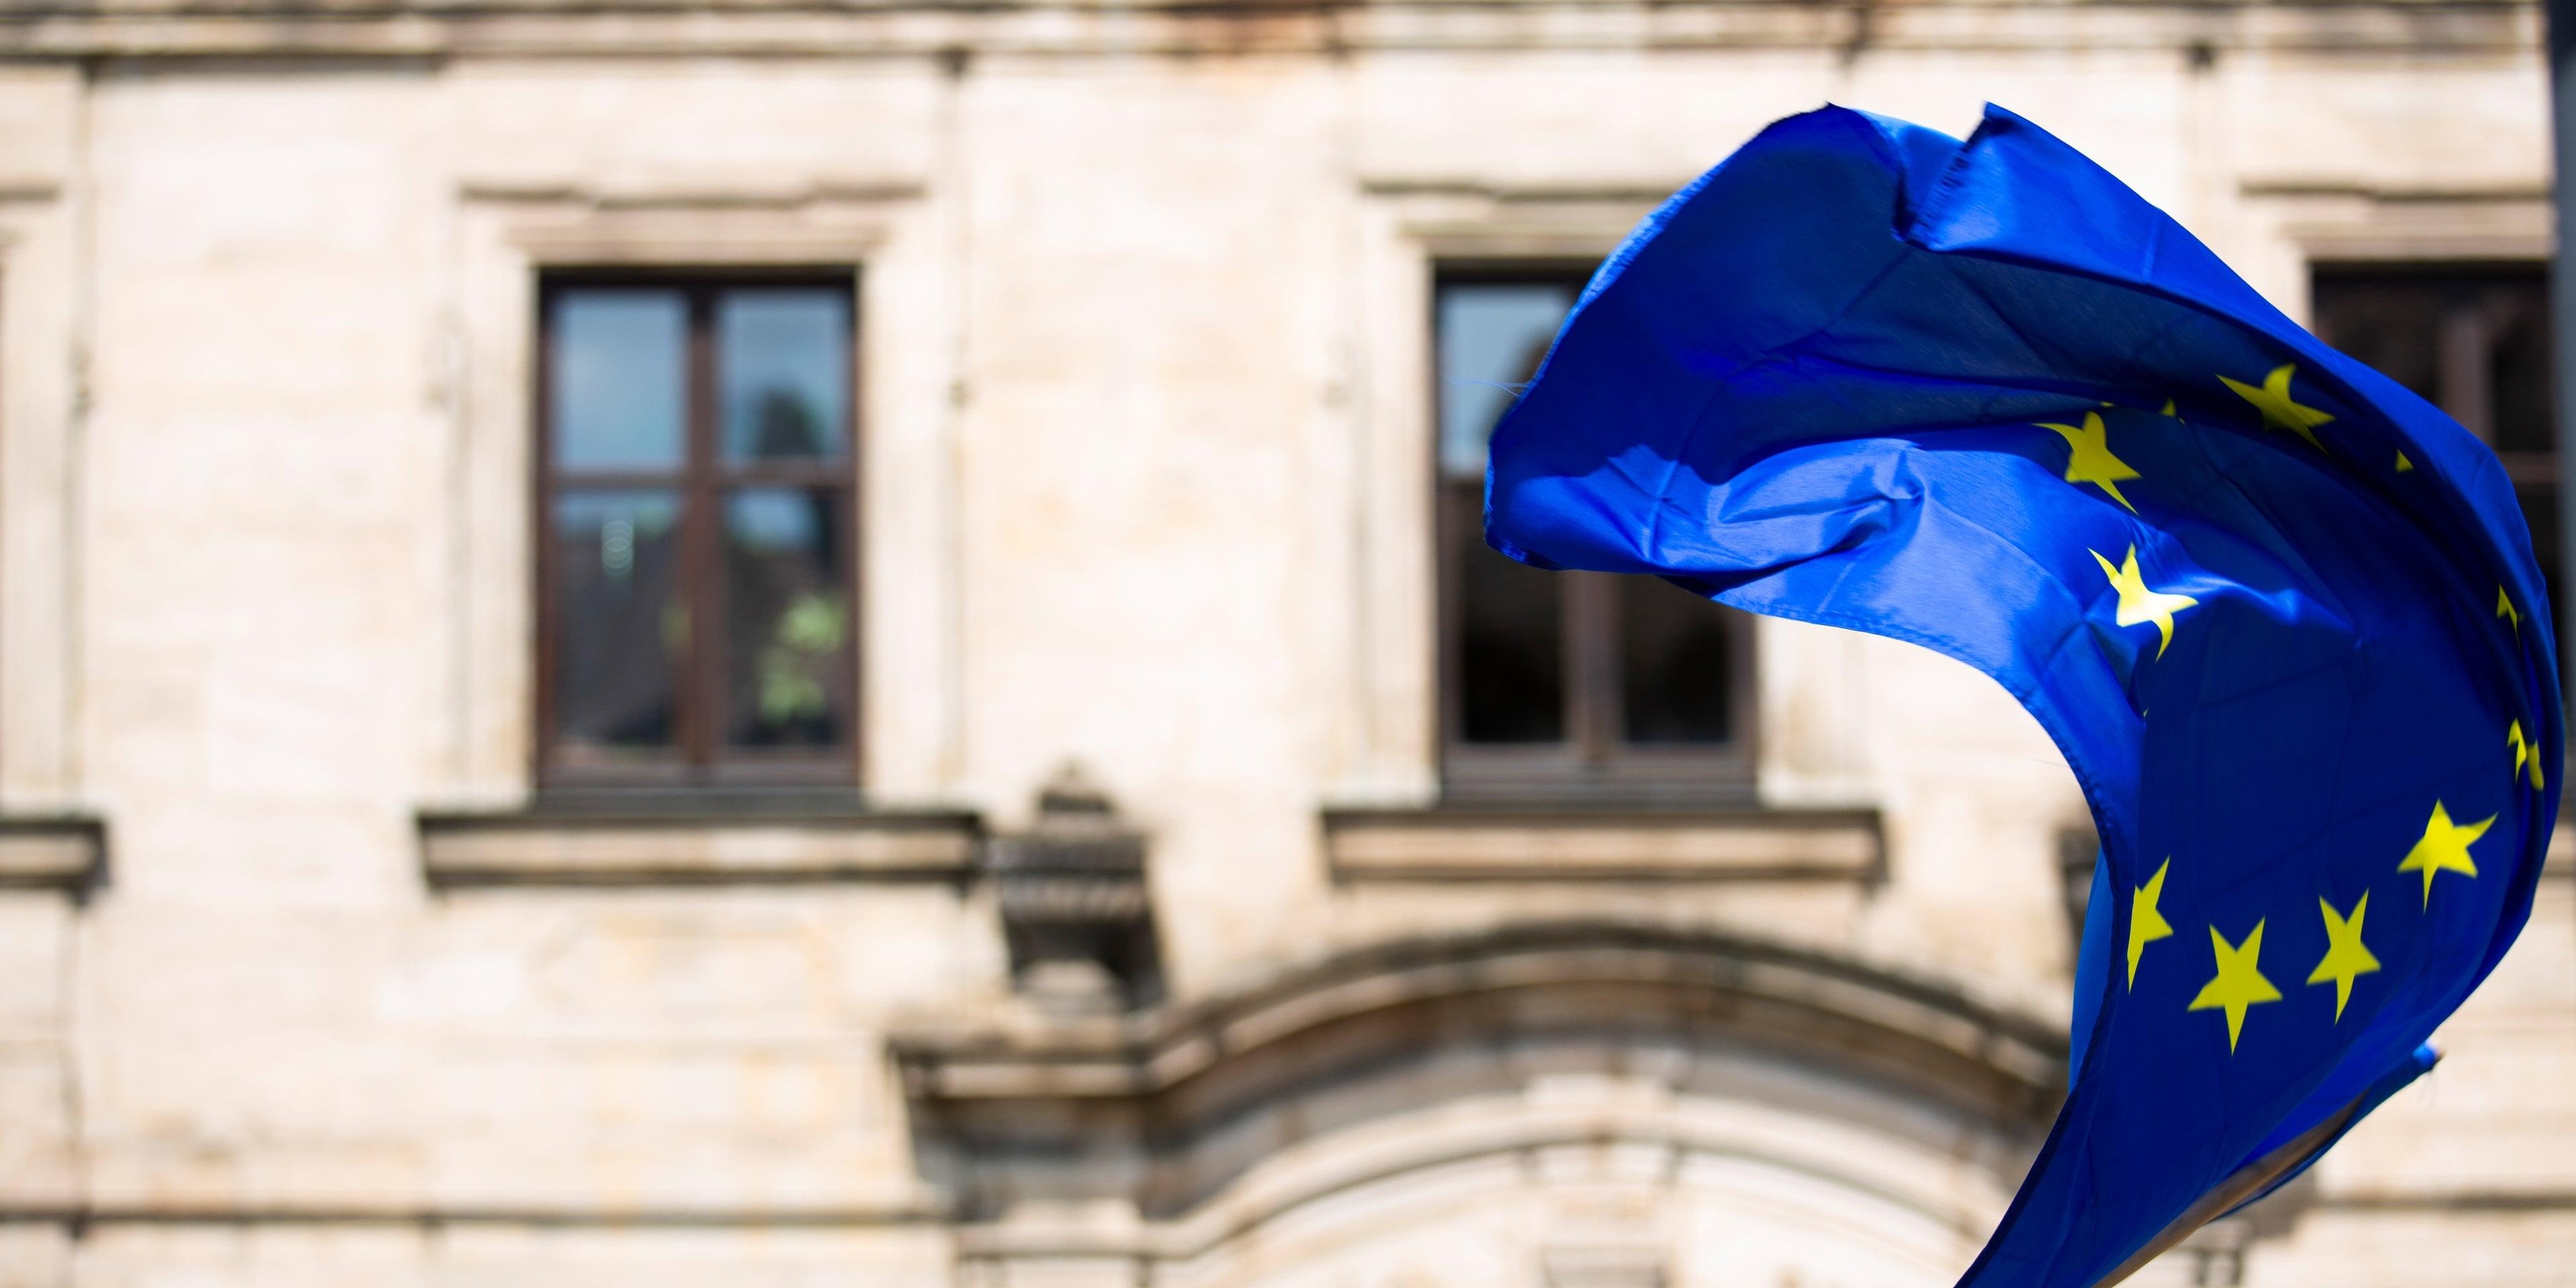 AI and RPA Are Strategic Priorities For European Union | UiPath